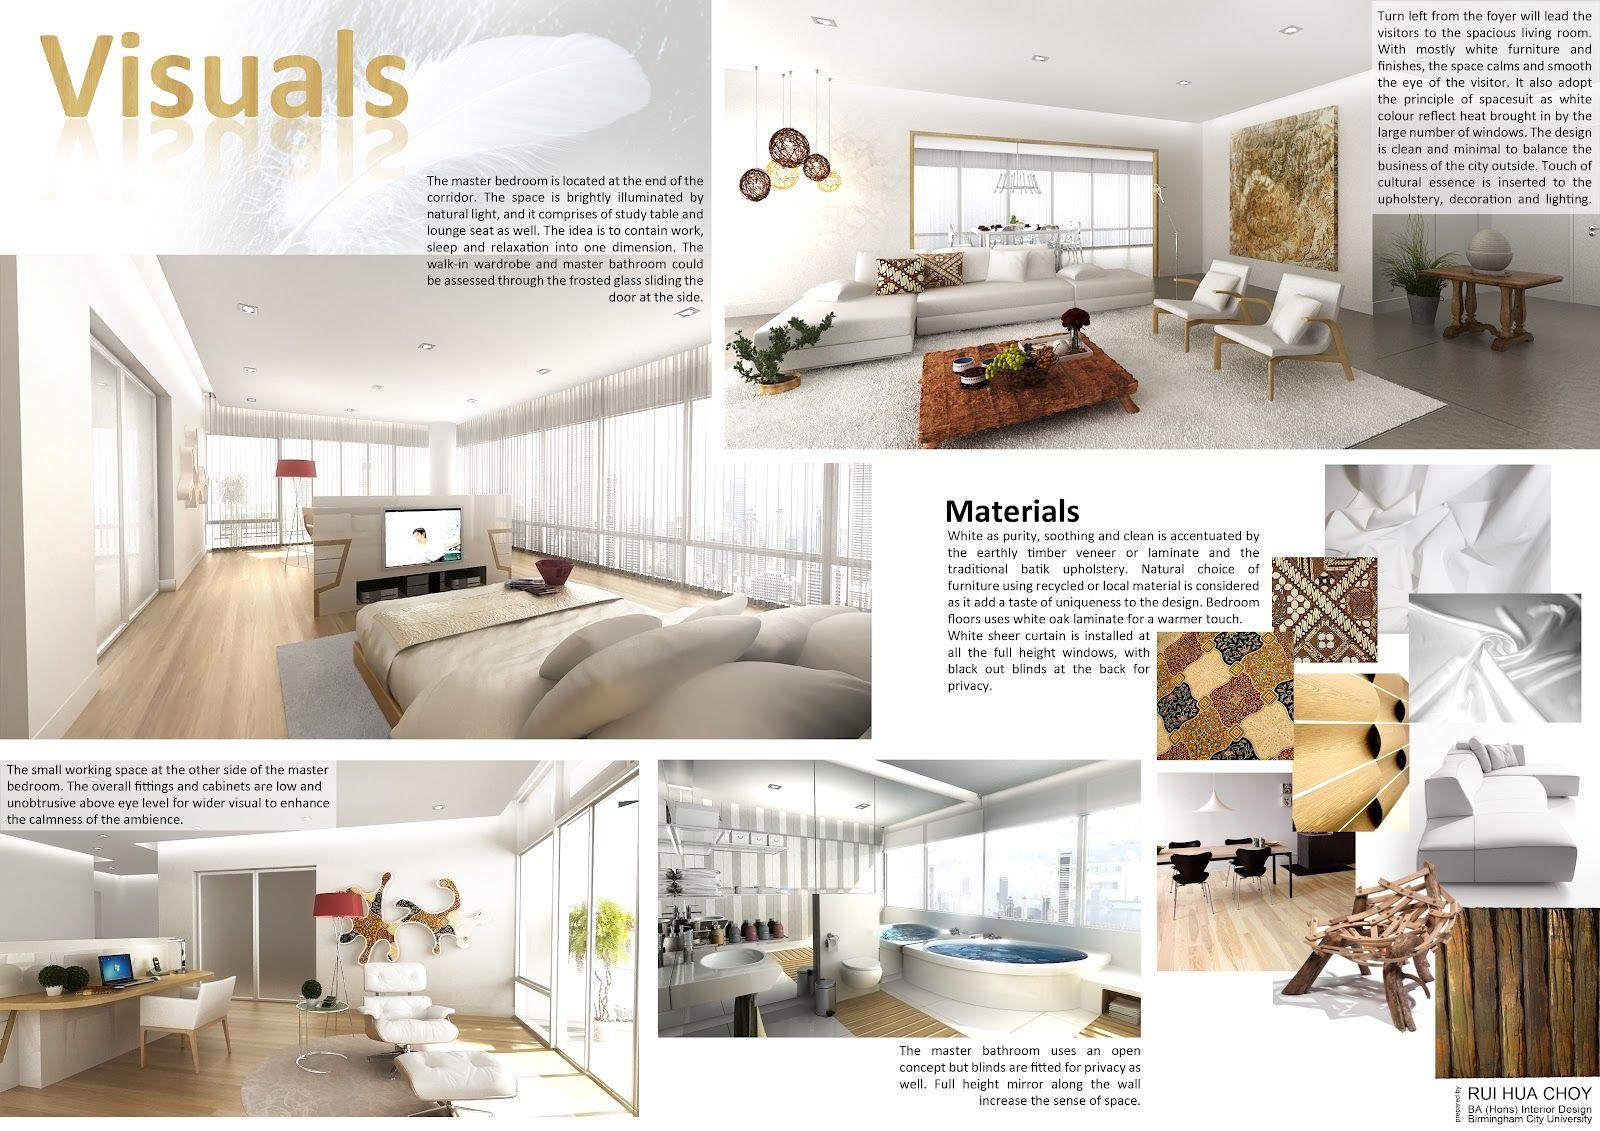 Pin by Labcor on PANELES | Pinterest | Board, Interiors ...